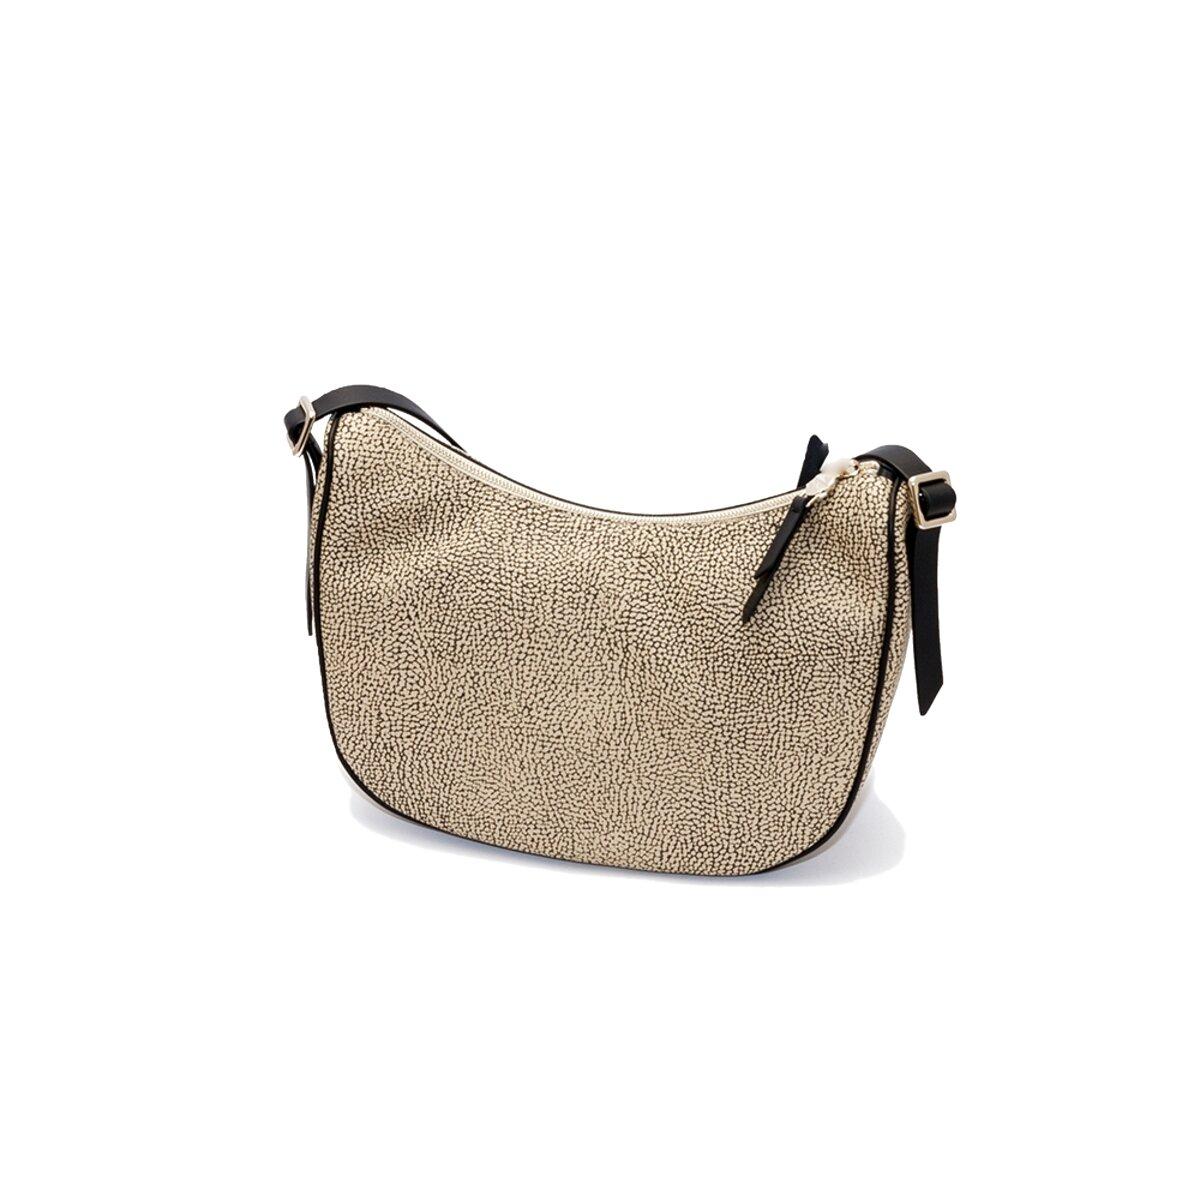 borbonese borsa mezzaluna usato